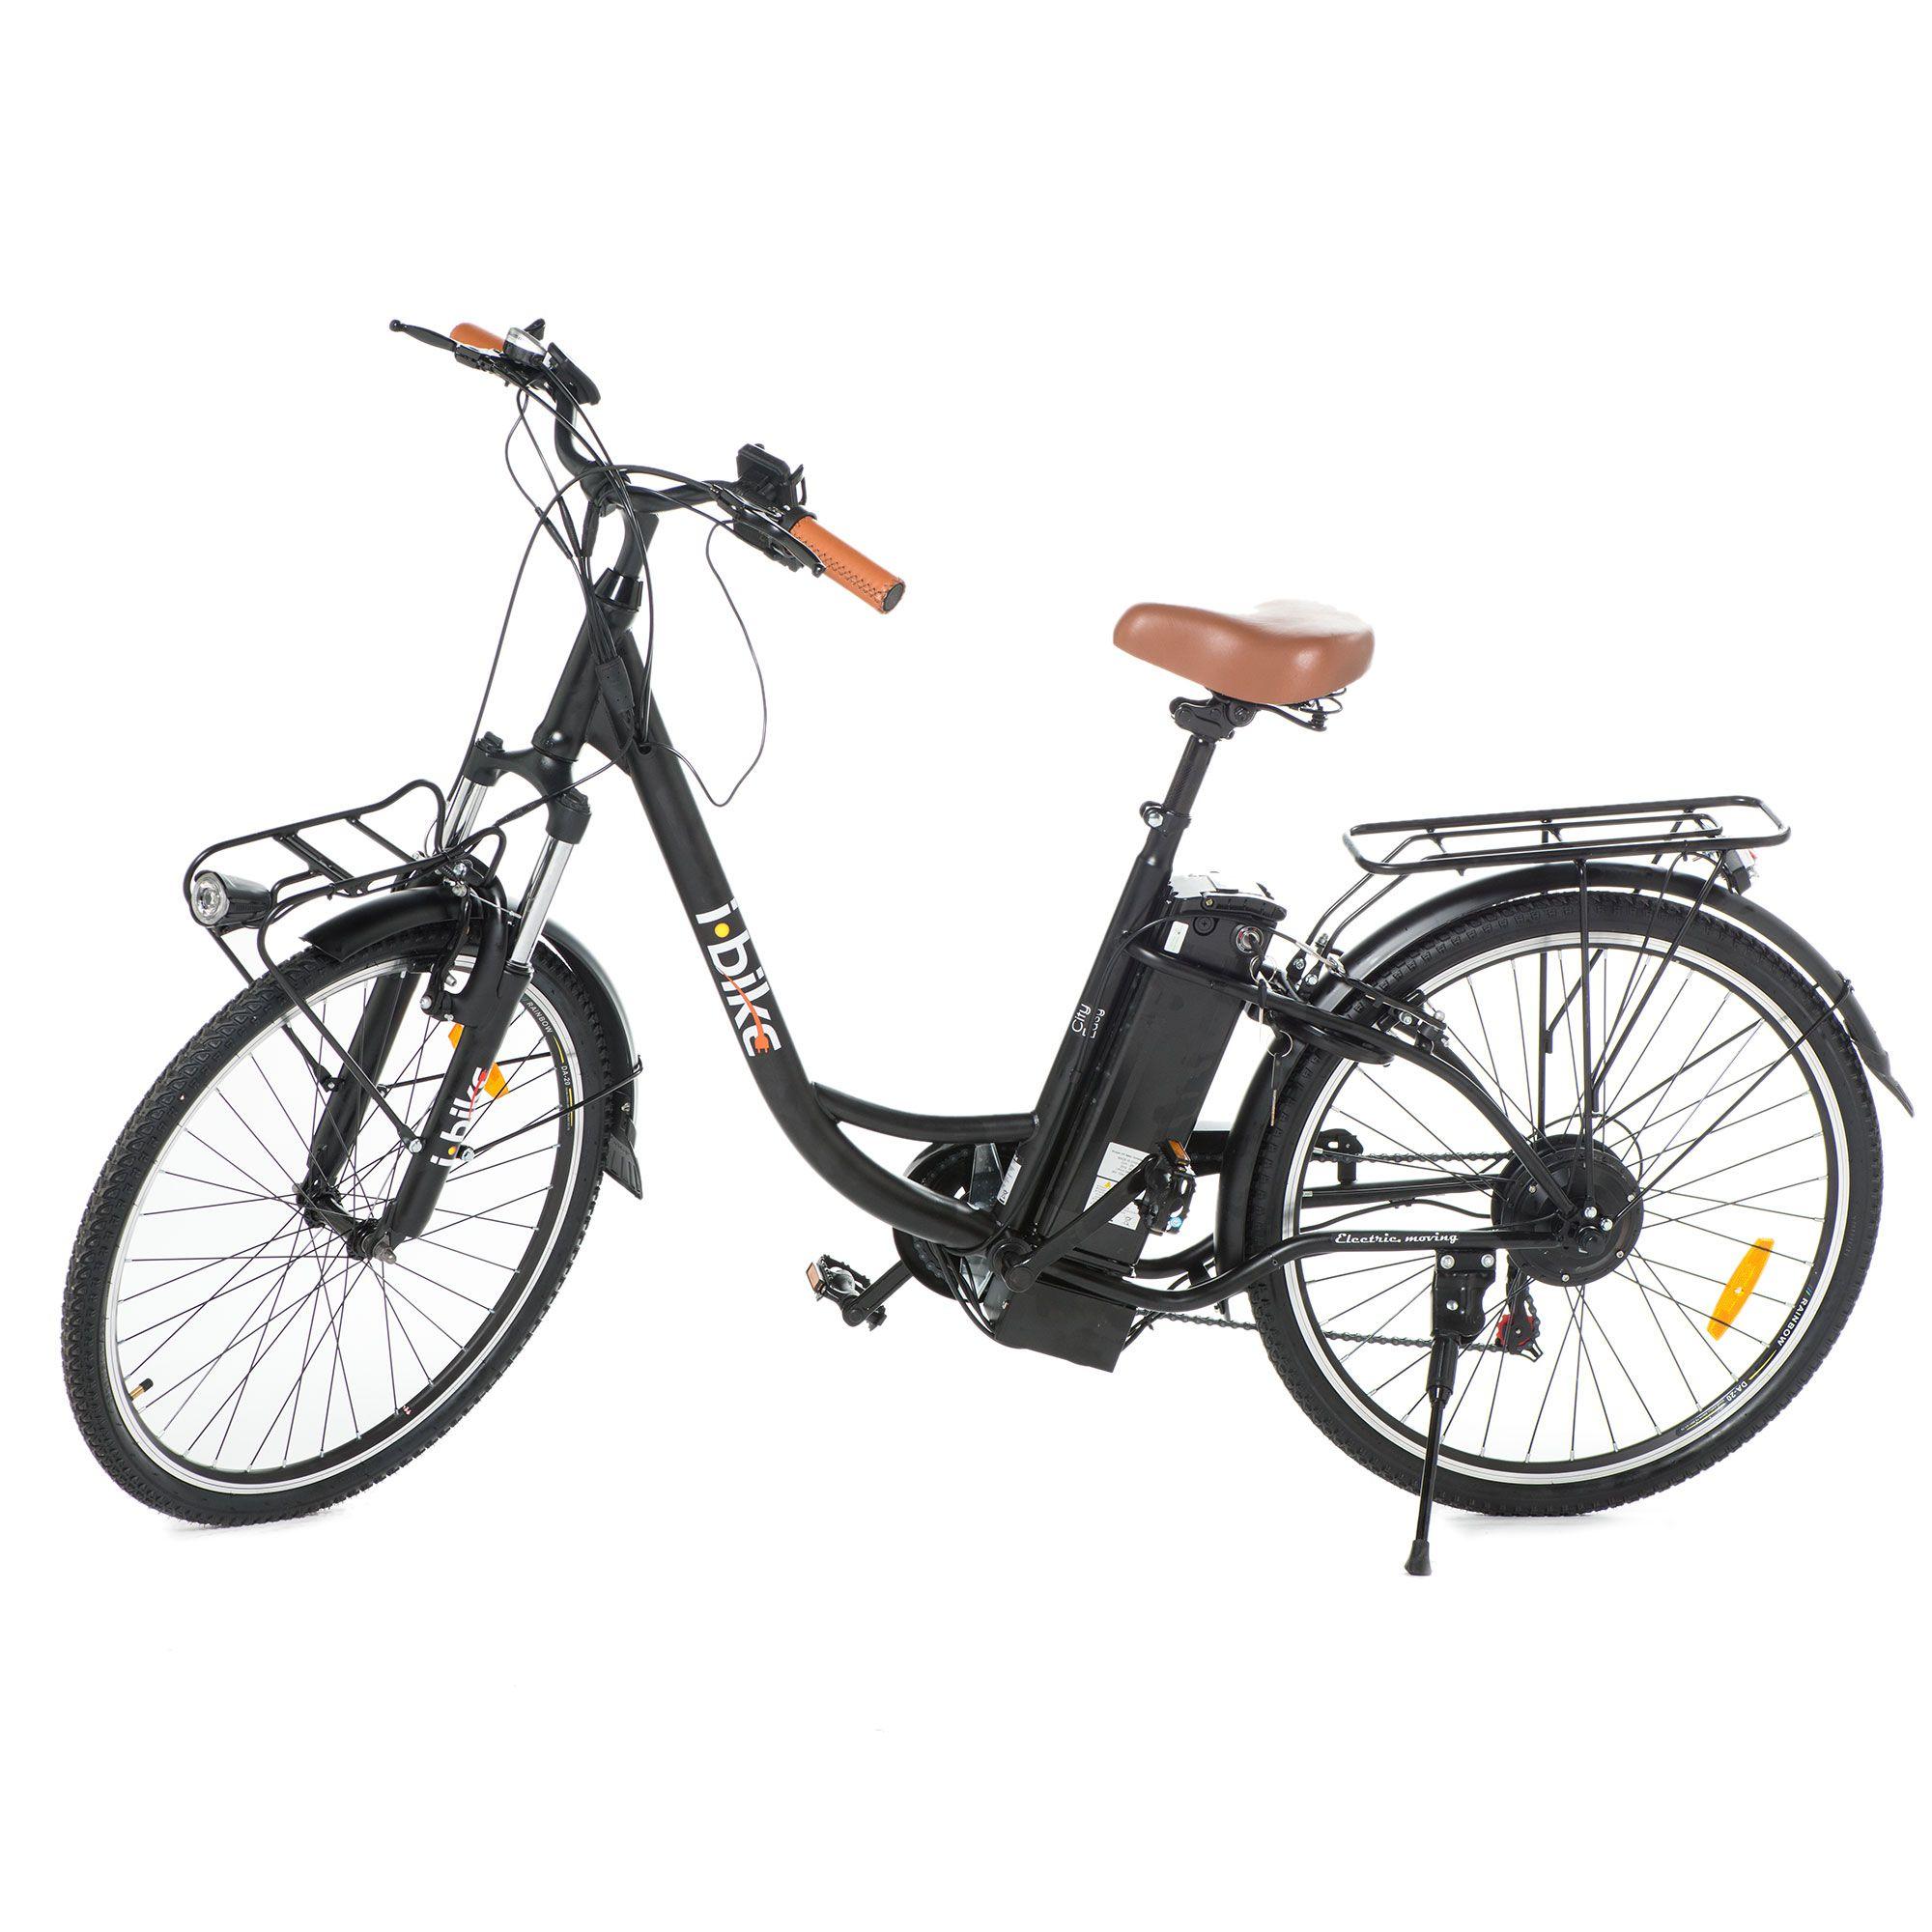 I-Bike Bici elettrica pedalata assistita autonomia 40km ...